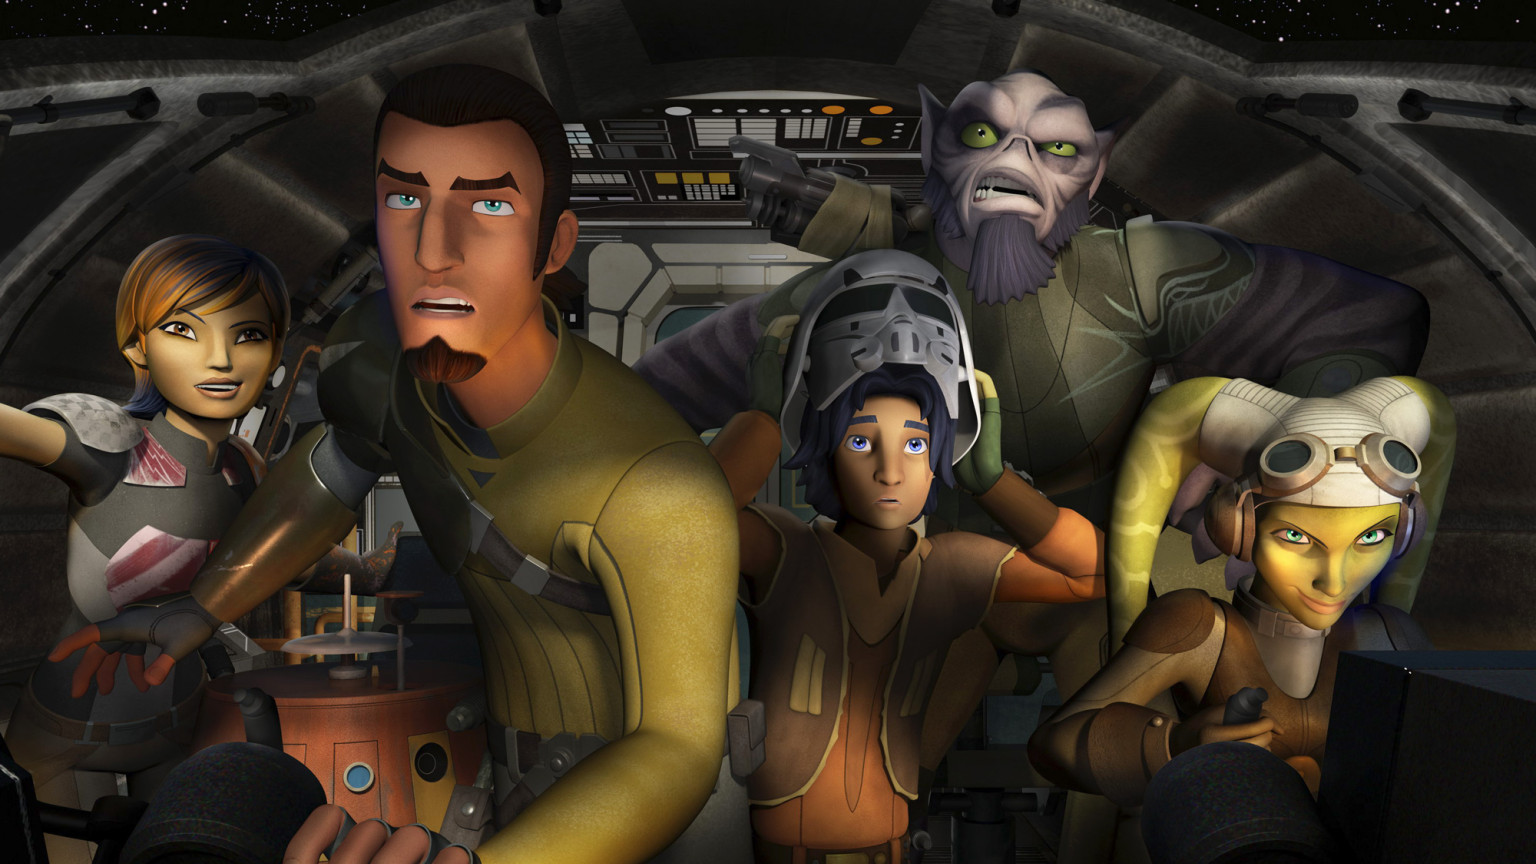 star-wars-rebels-premiere-1536×864-428036123048